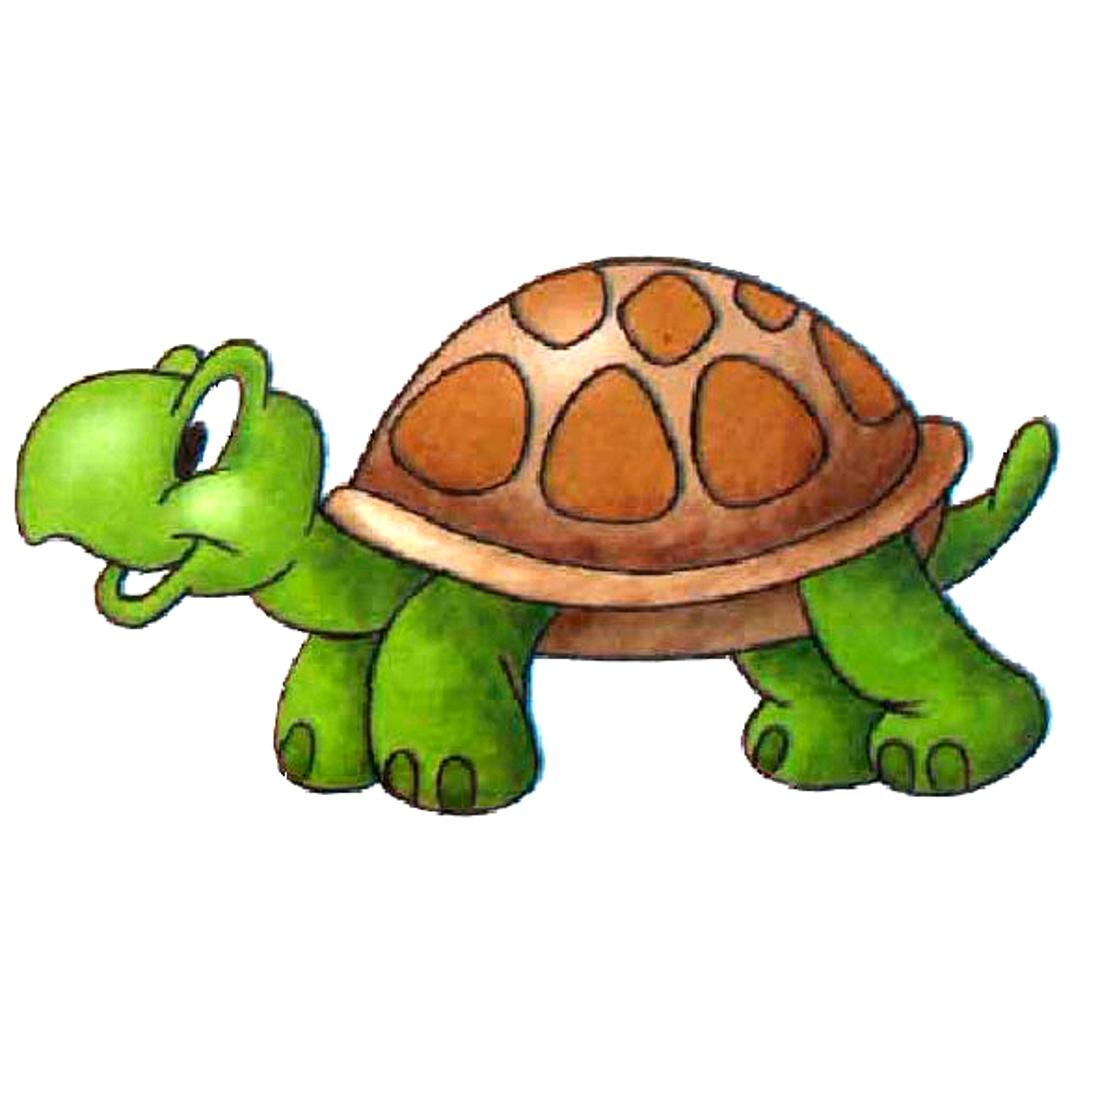 черепаха рисунок фото котята красный